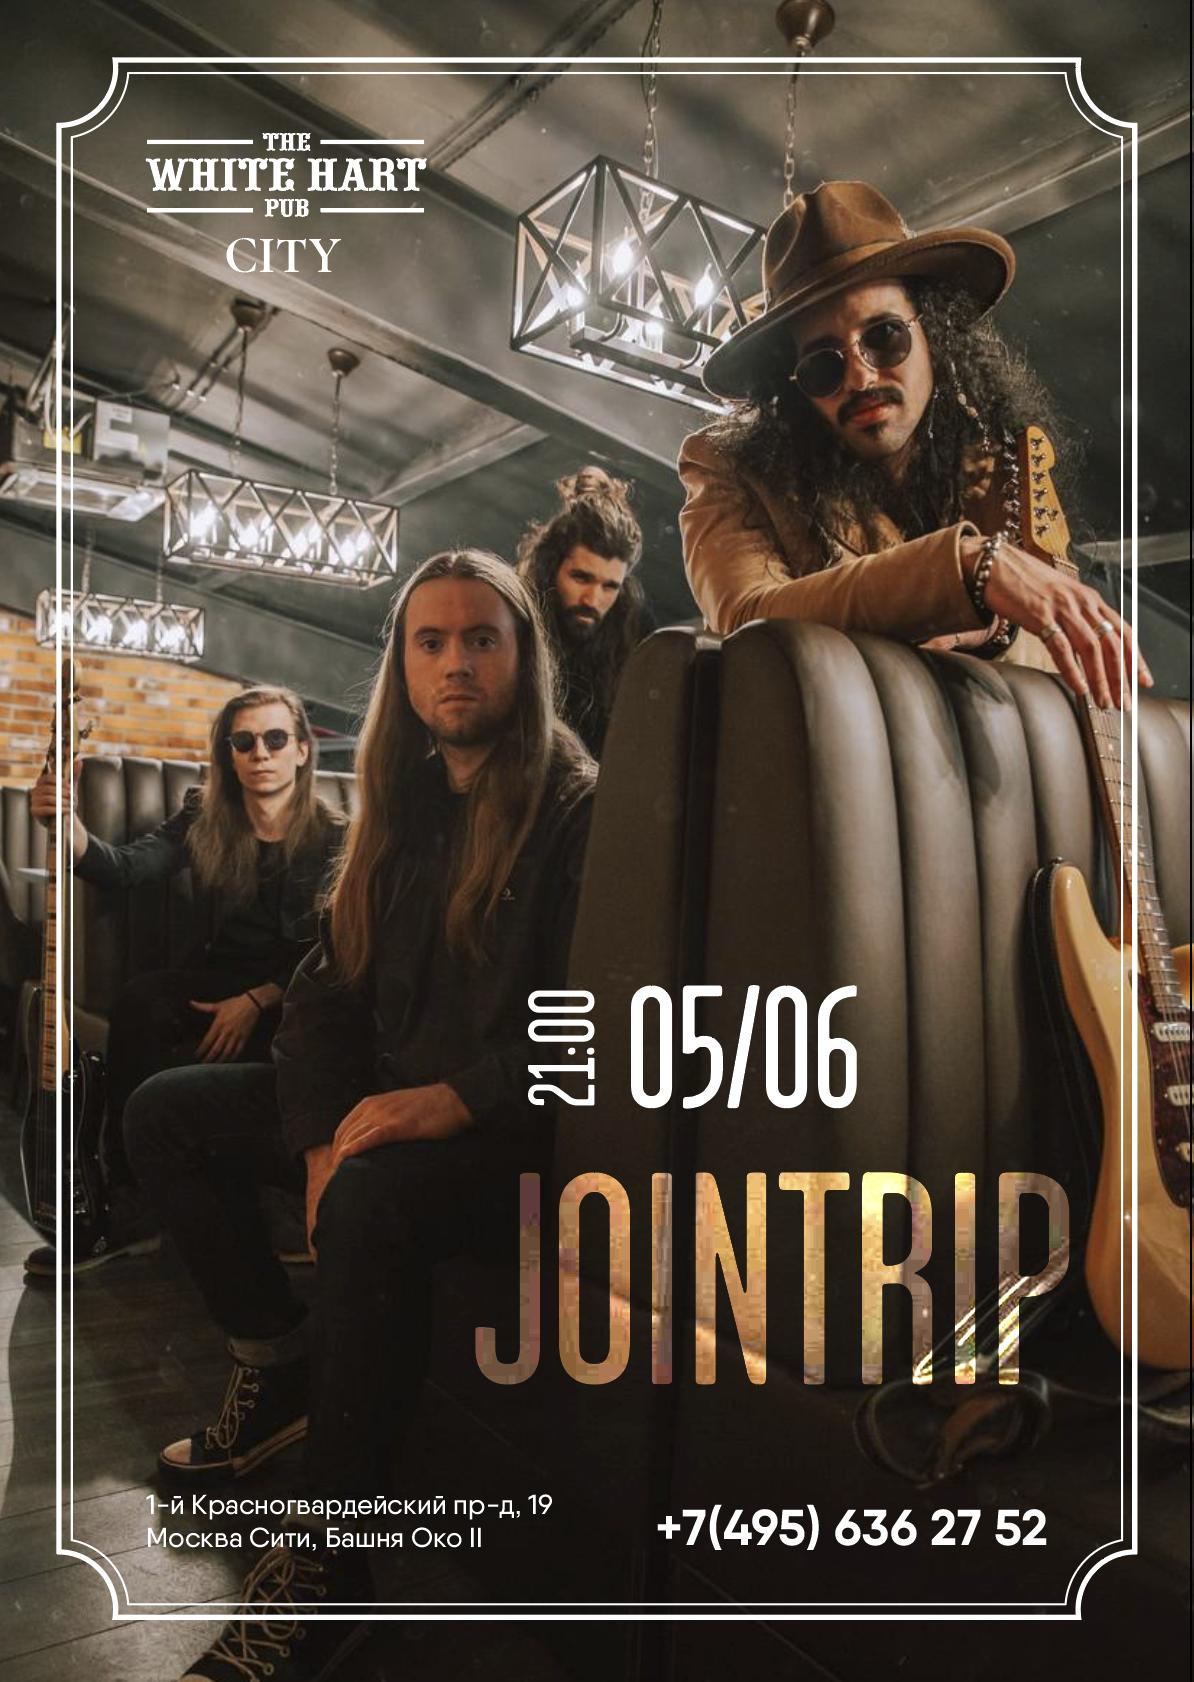 Афиша! 05 Июня — Кавер группа JoinTrip в White Hart Pub Moscow City